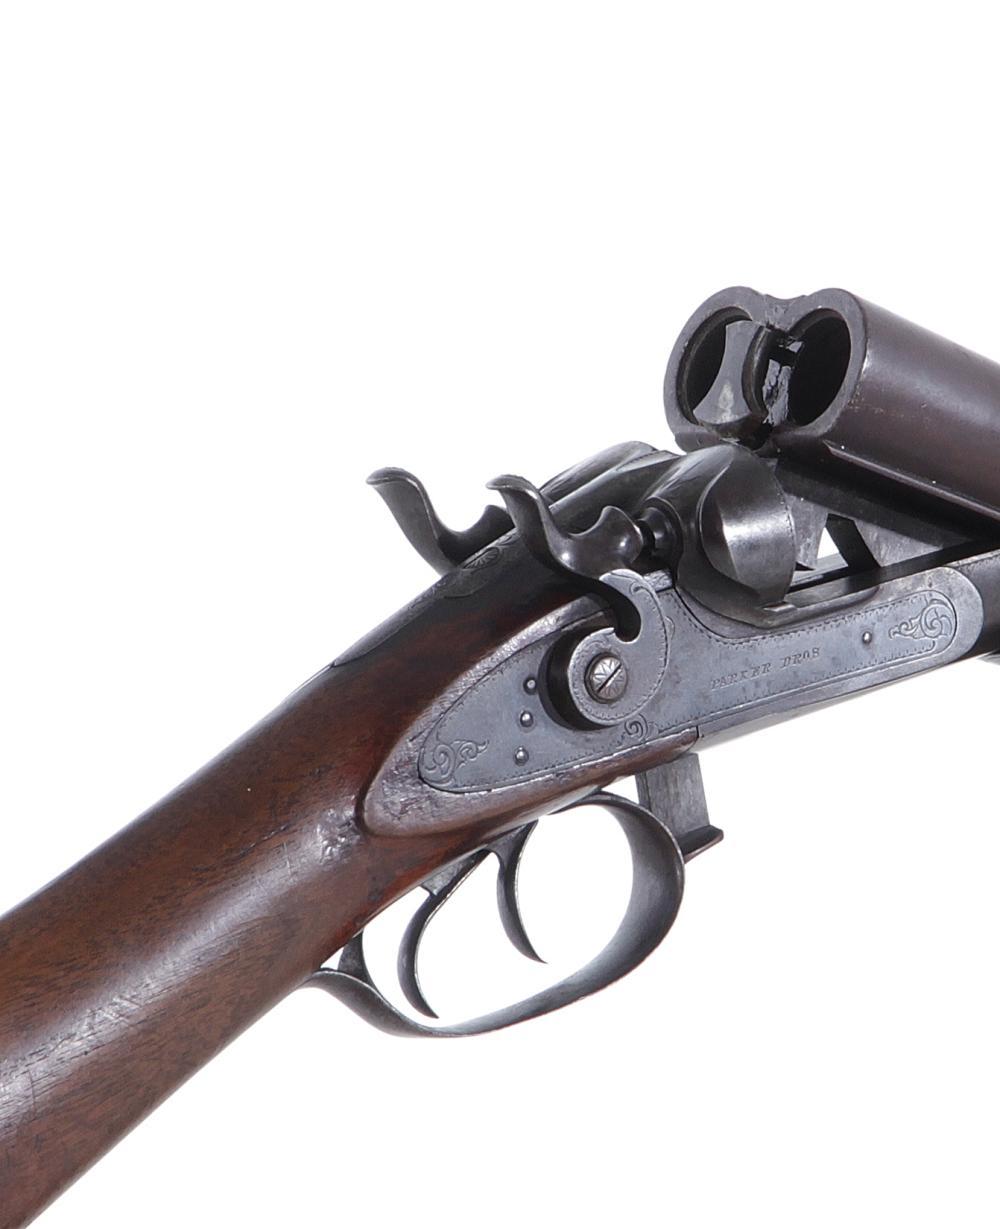 Parker Bros 12ga SXS shotgun ***Federal Laws Apply***